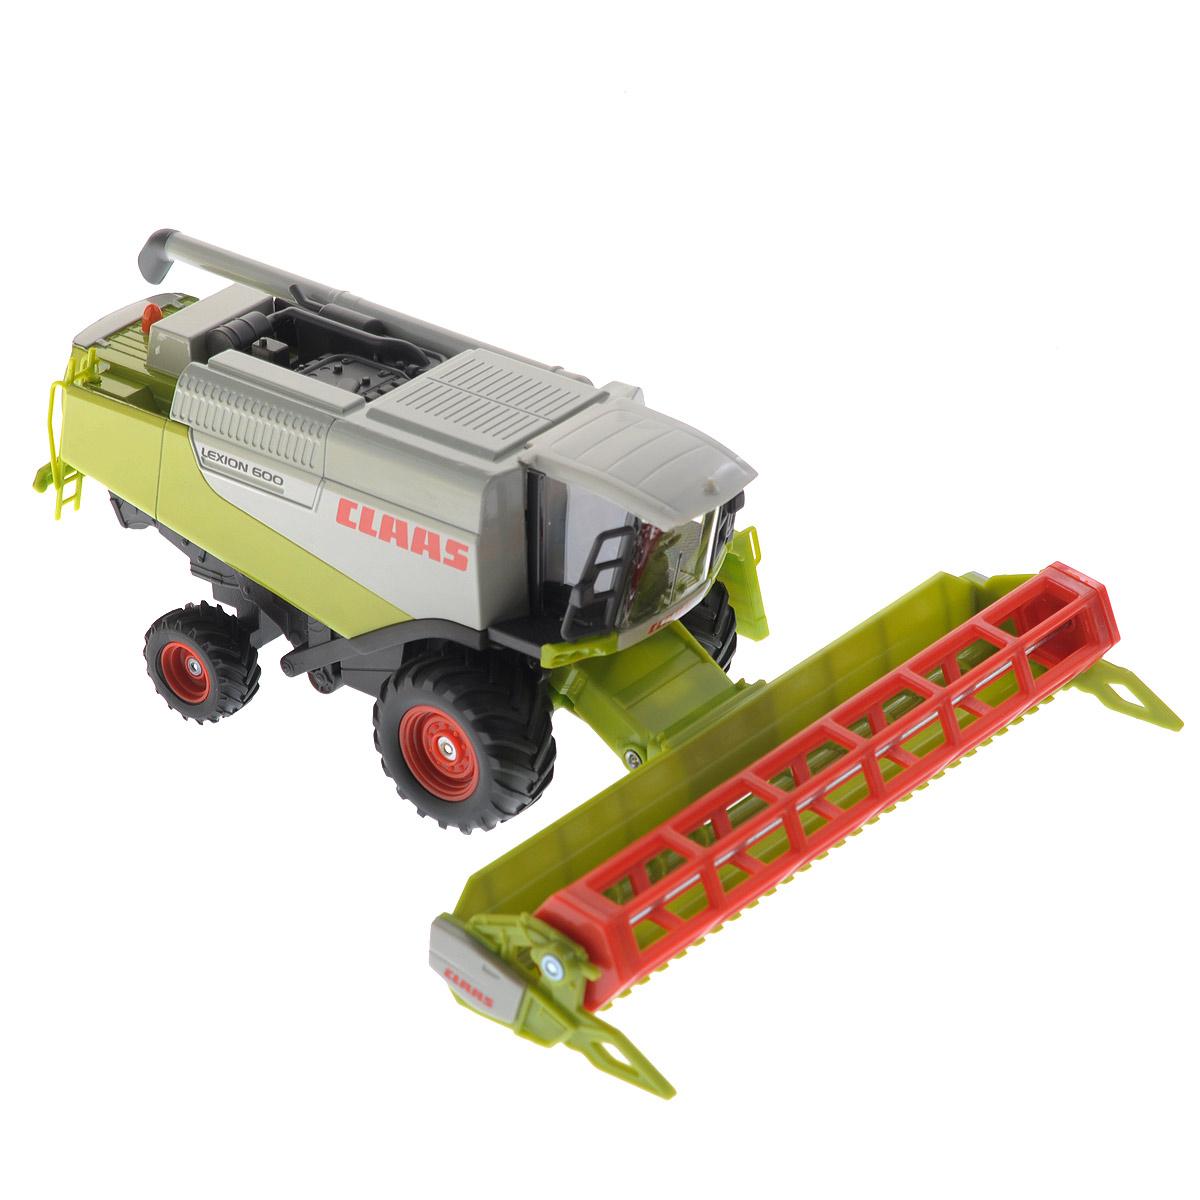 Siku Комбайн Claas Lexion 600 siku трактор claas xerion 5000